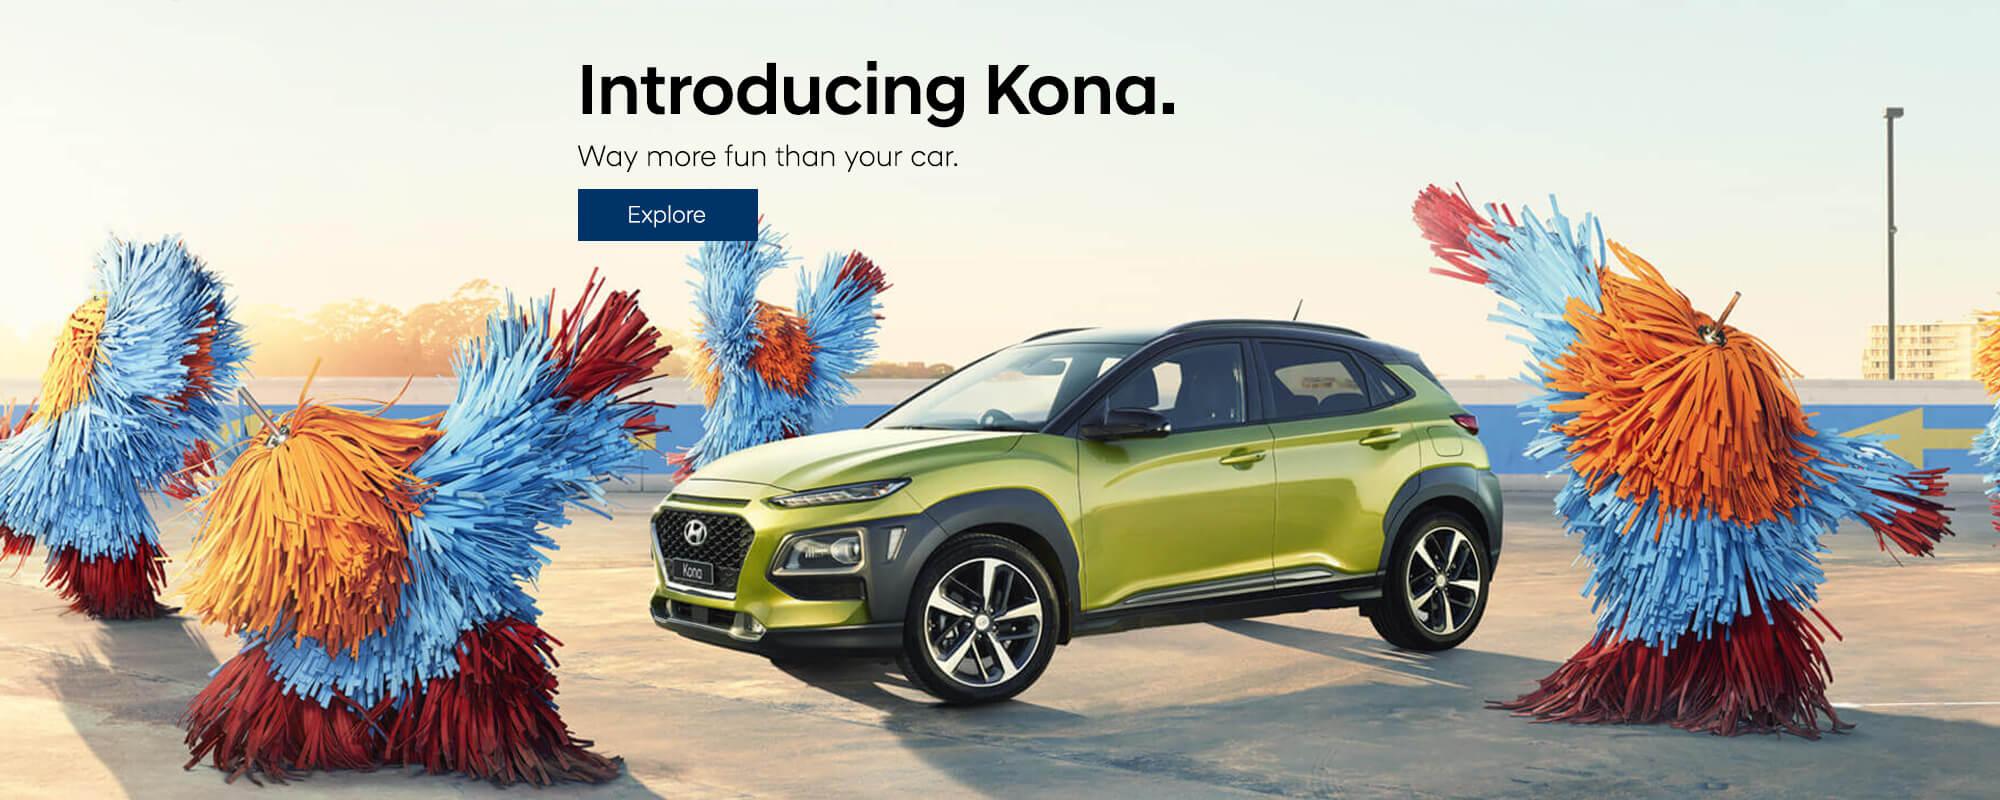 All-New Kona